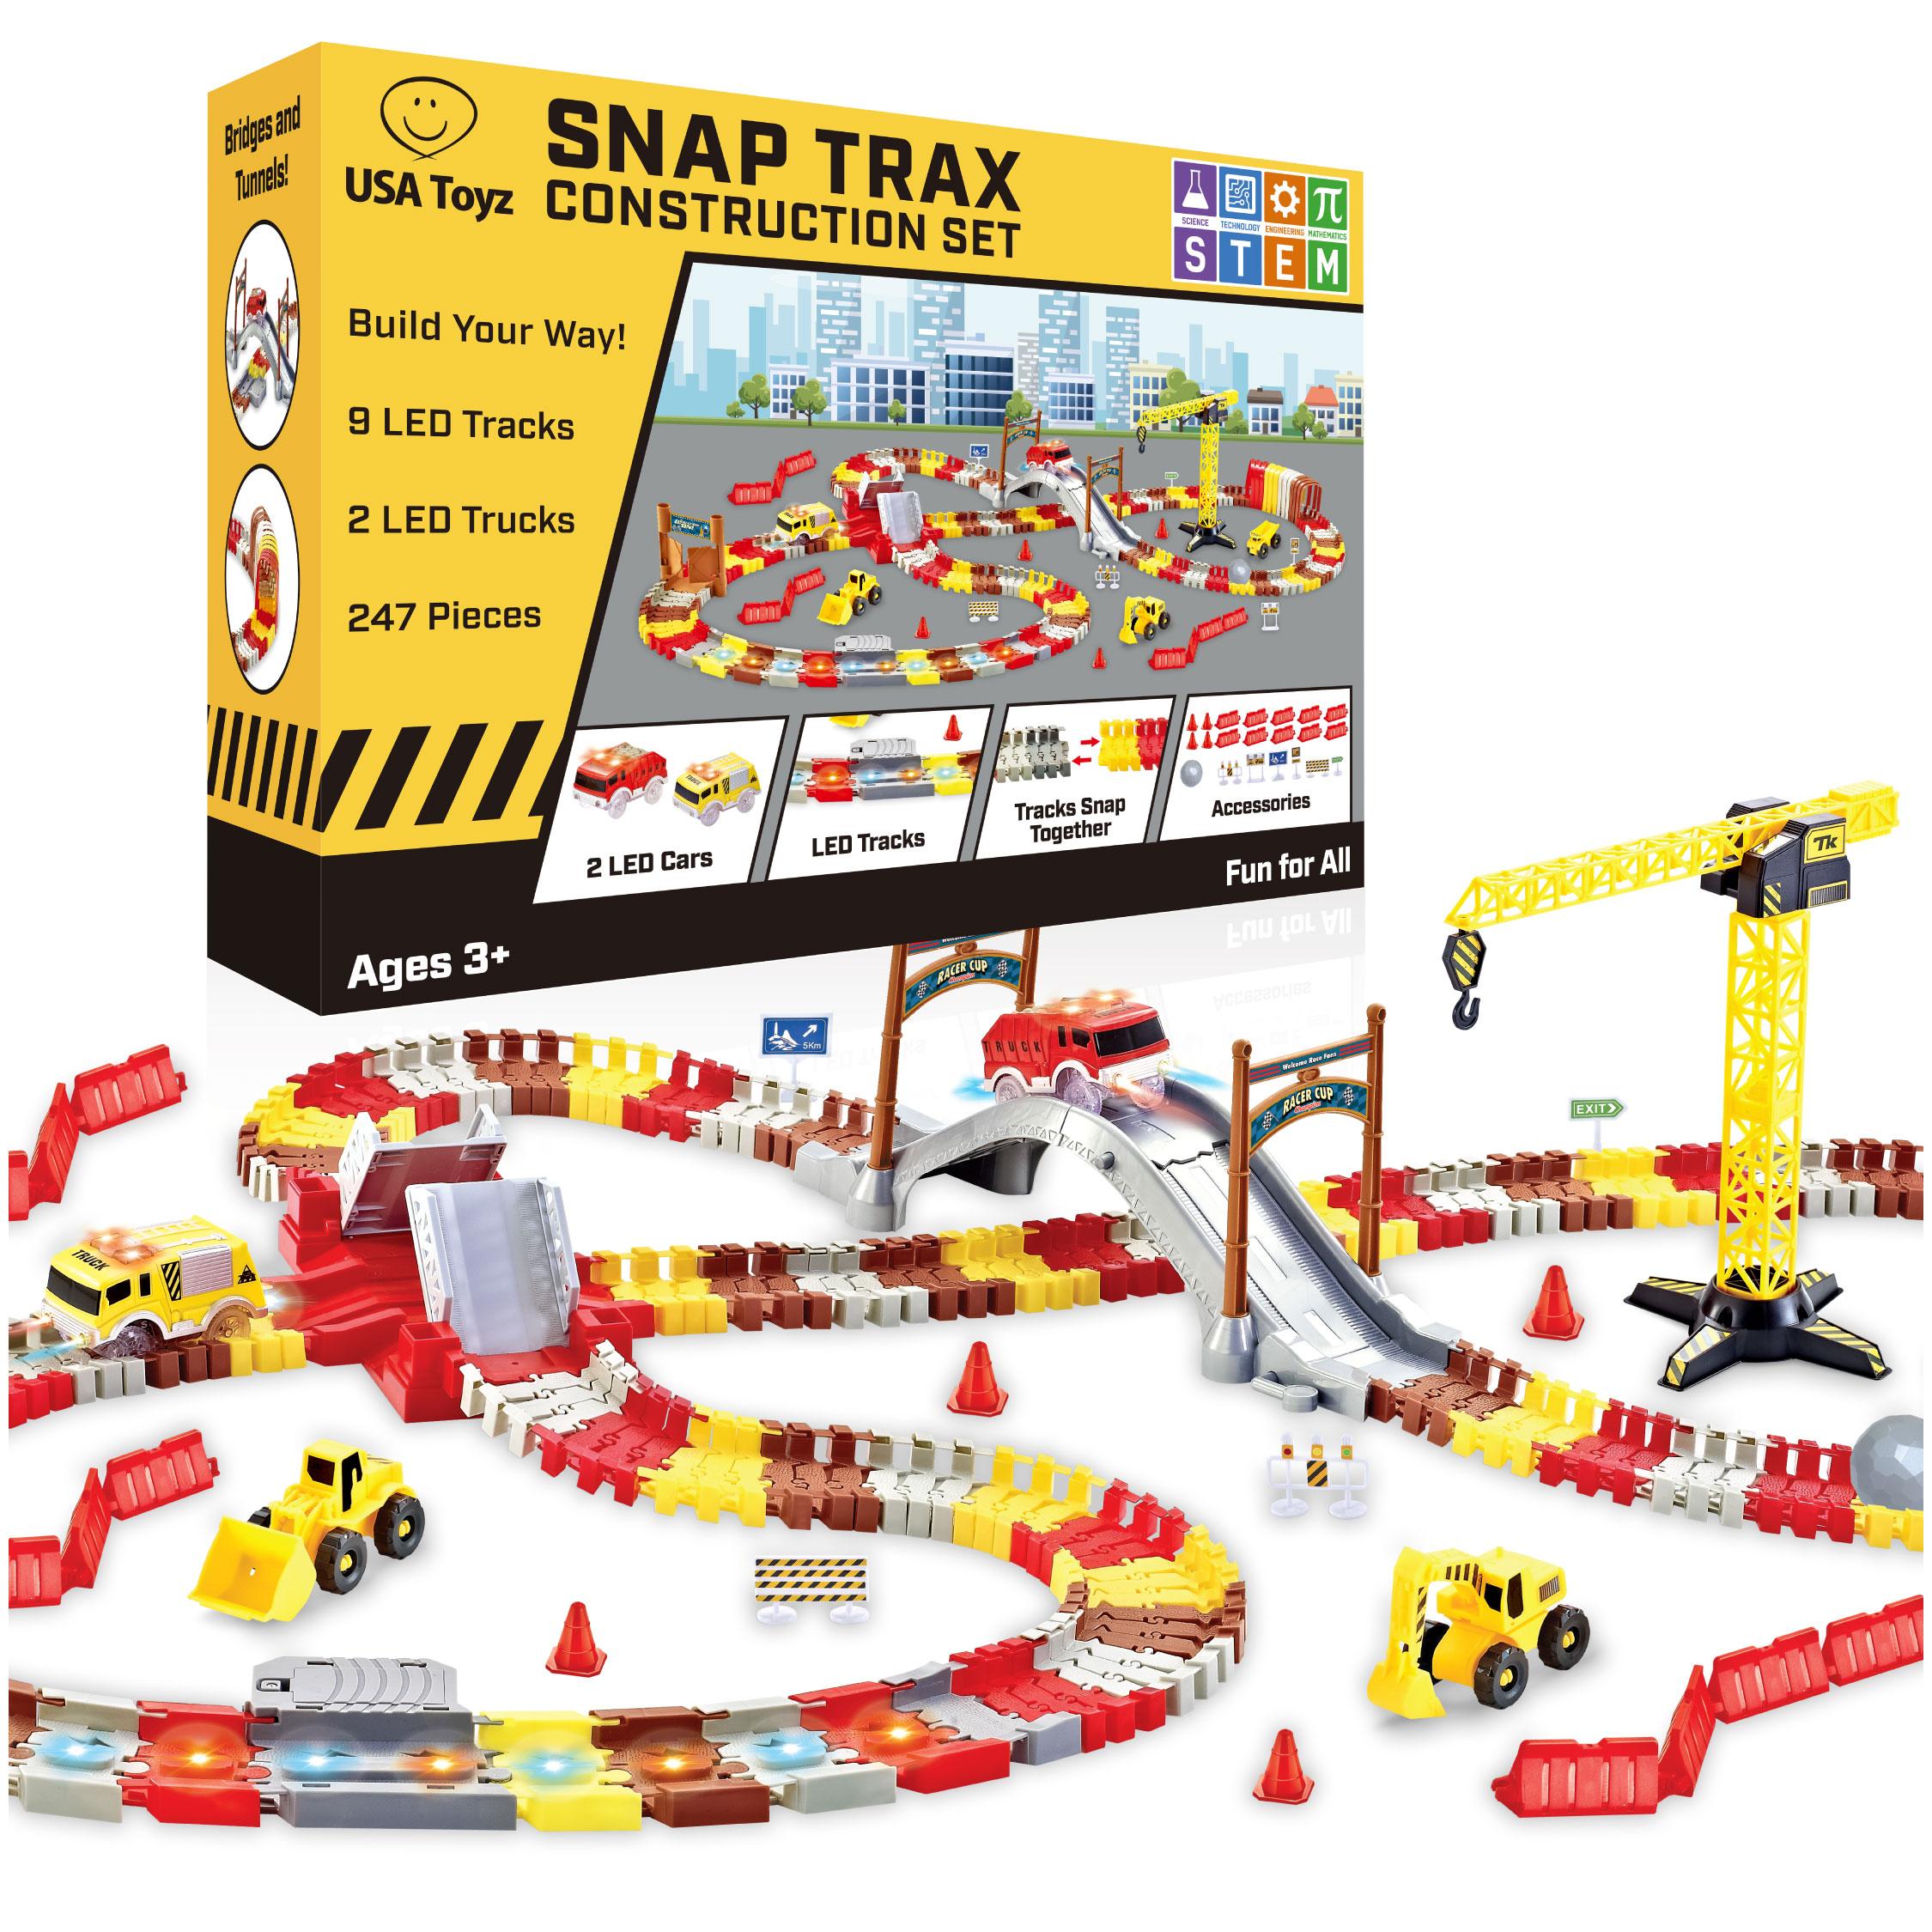 Snap Trax Construction Set